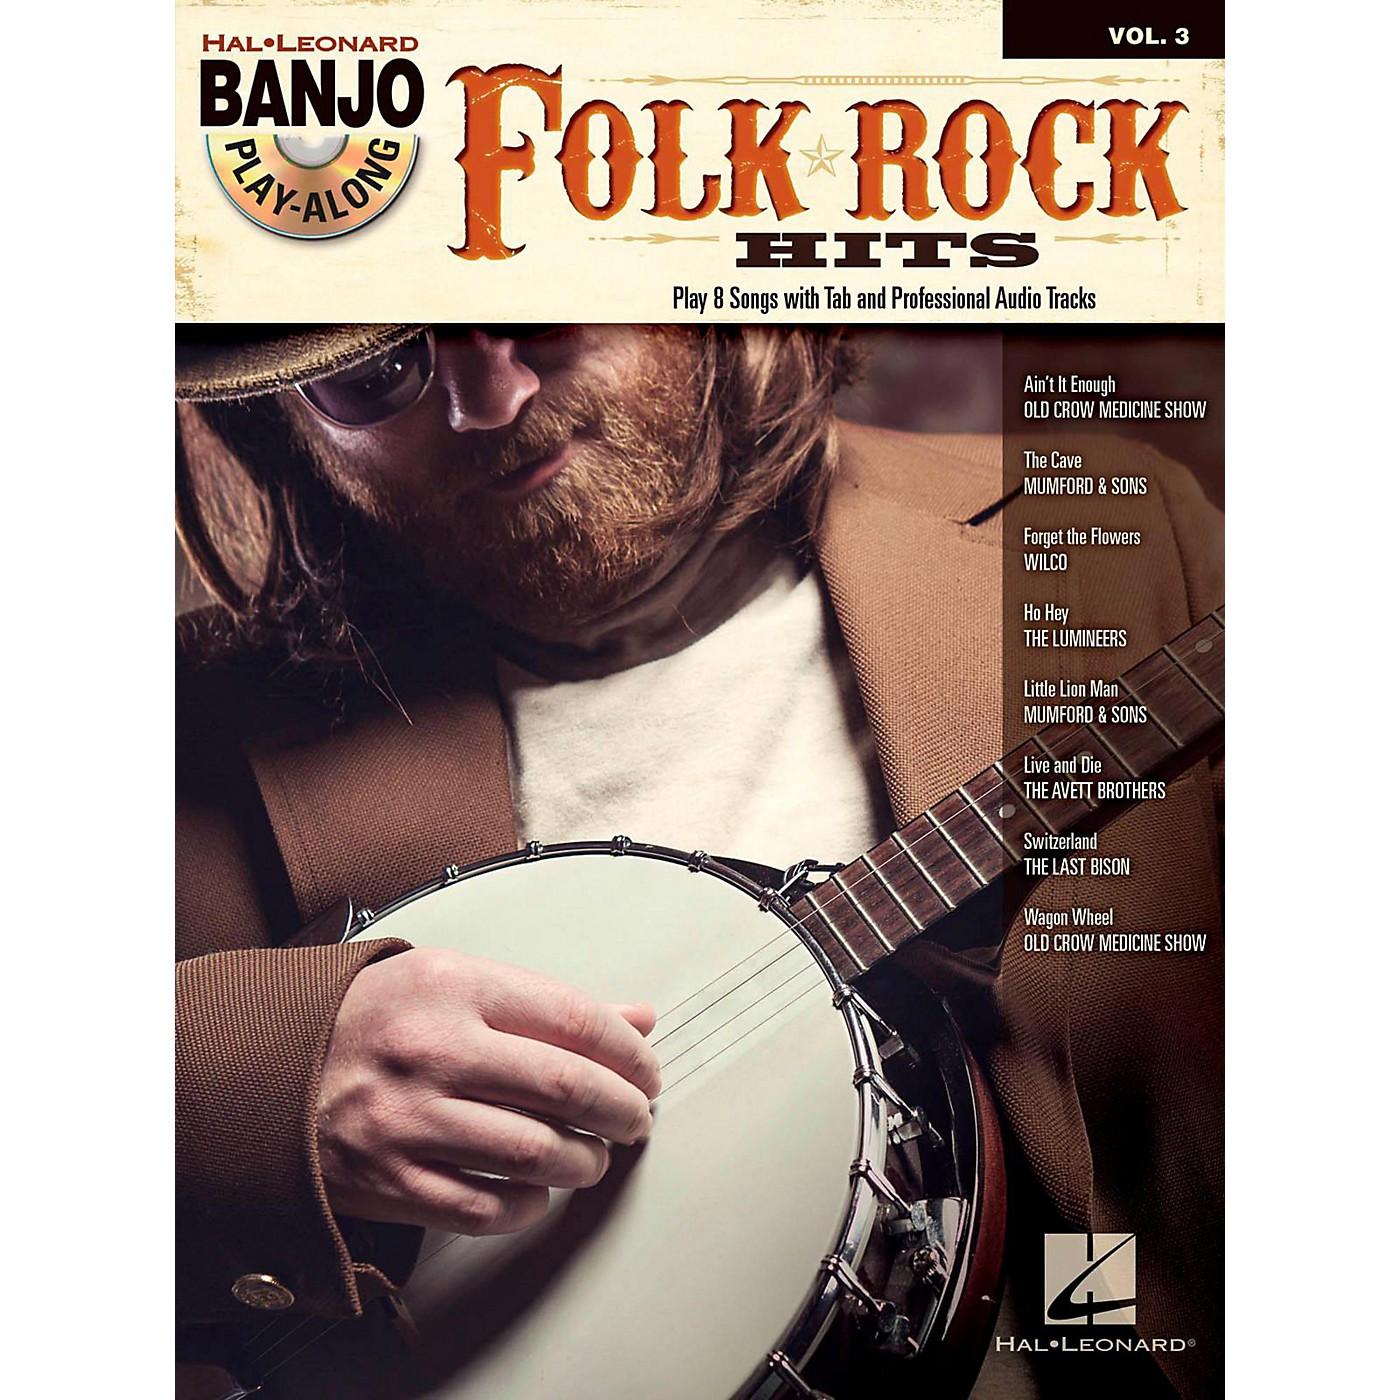 Hal Leonard Folk/Rock Hits Banjo Play-Along Volume 3 Book/CD thumbnail